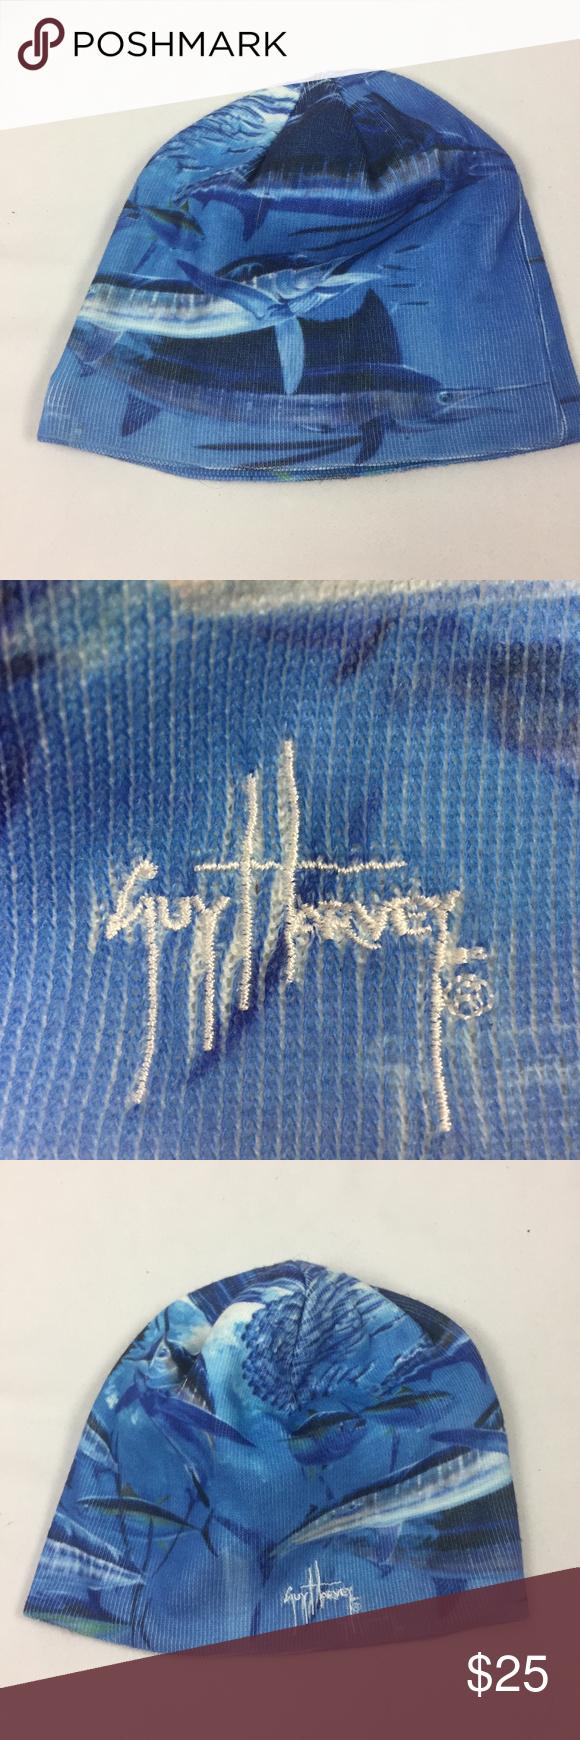 a6f8b0f60513e Guy Harvey Billfish Mural Beanie Guy Harvey Billfish Mural Beanie Guy Harvey  Accessories Hats